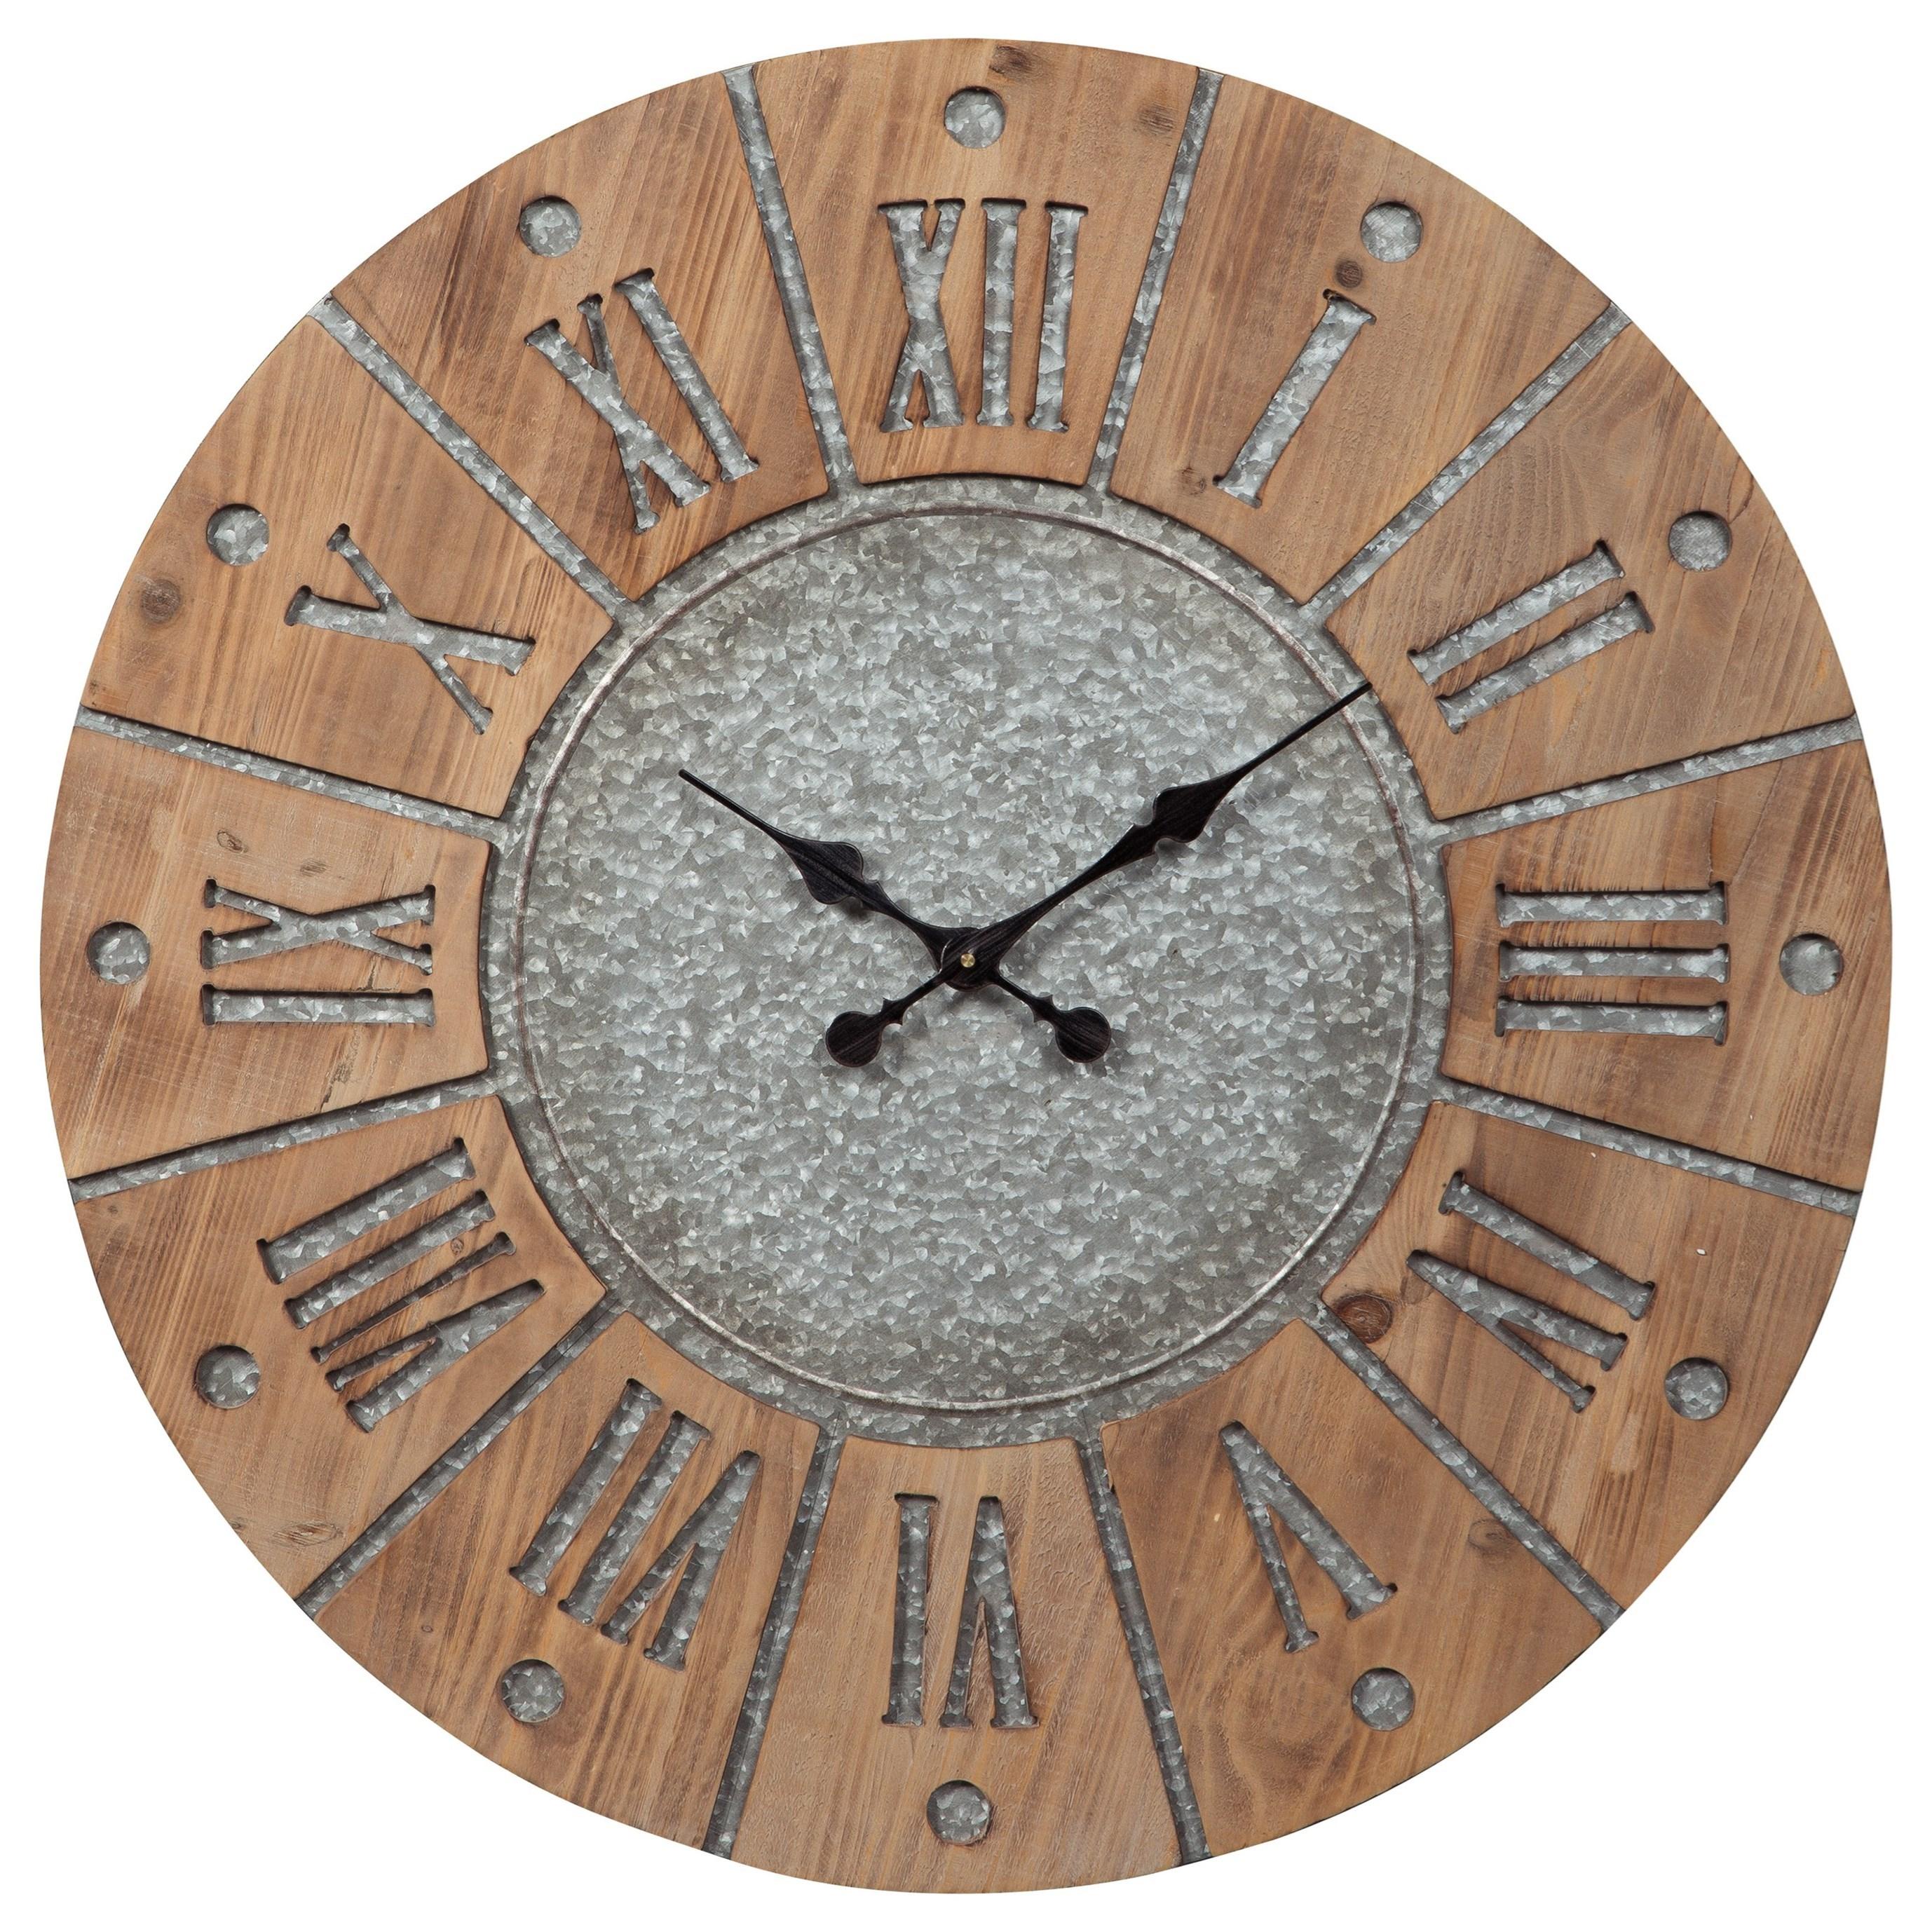 Wall Art Payson Antique Gray/Natural Wall Clock by Ashley (Signature Design) at Johnny Janosik